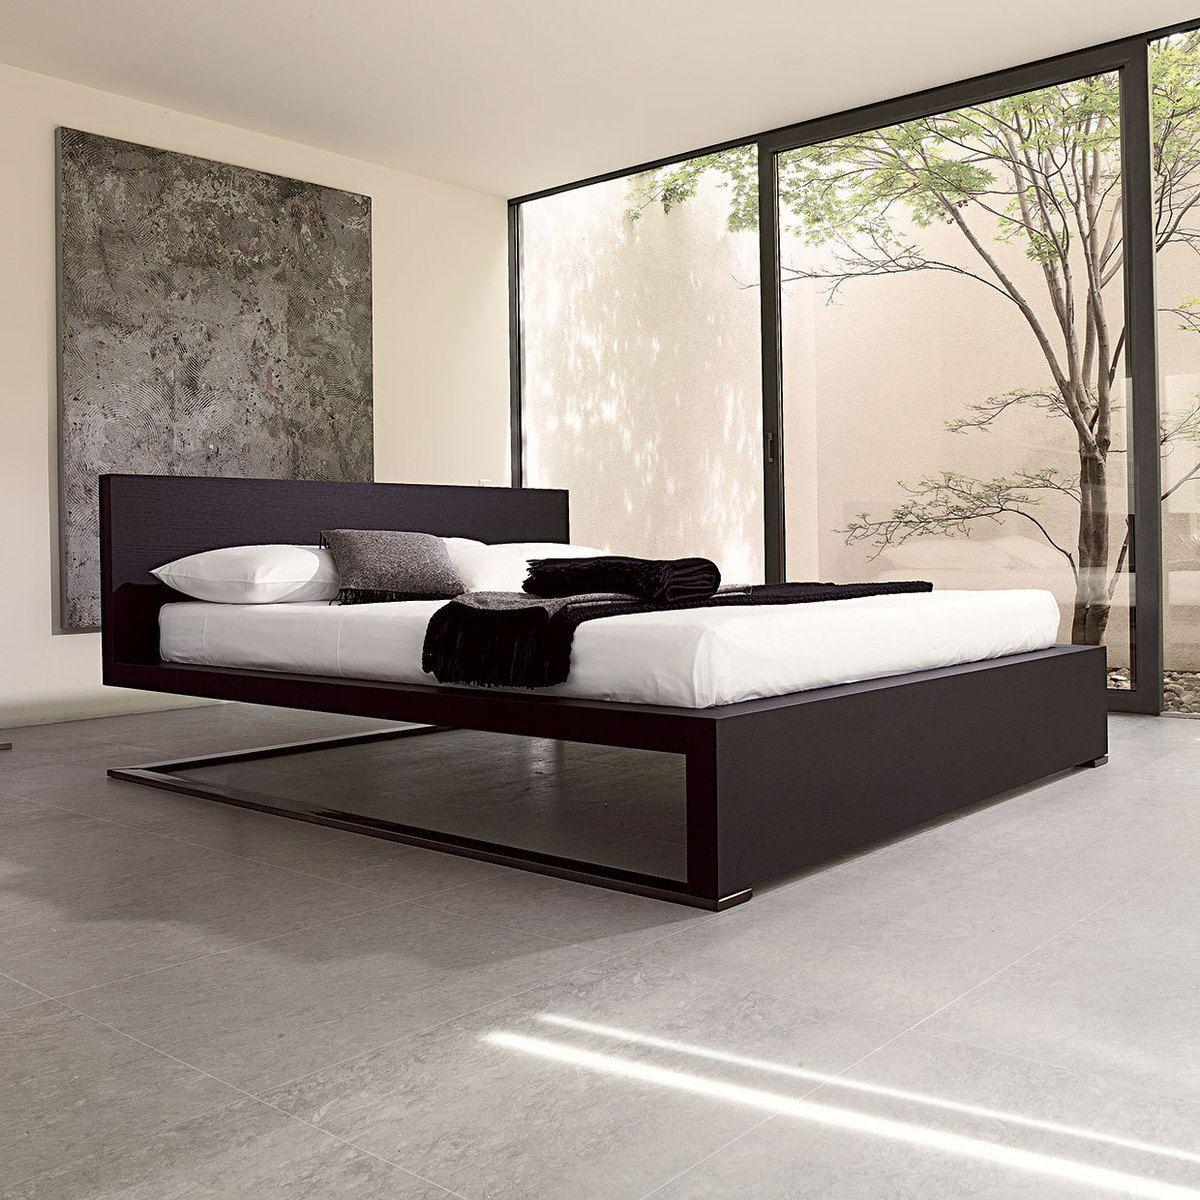 Best Urano Bed Ddc P*Nth**S* Top Tier European Furniture 400 x 300